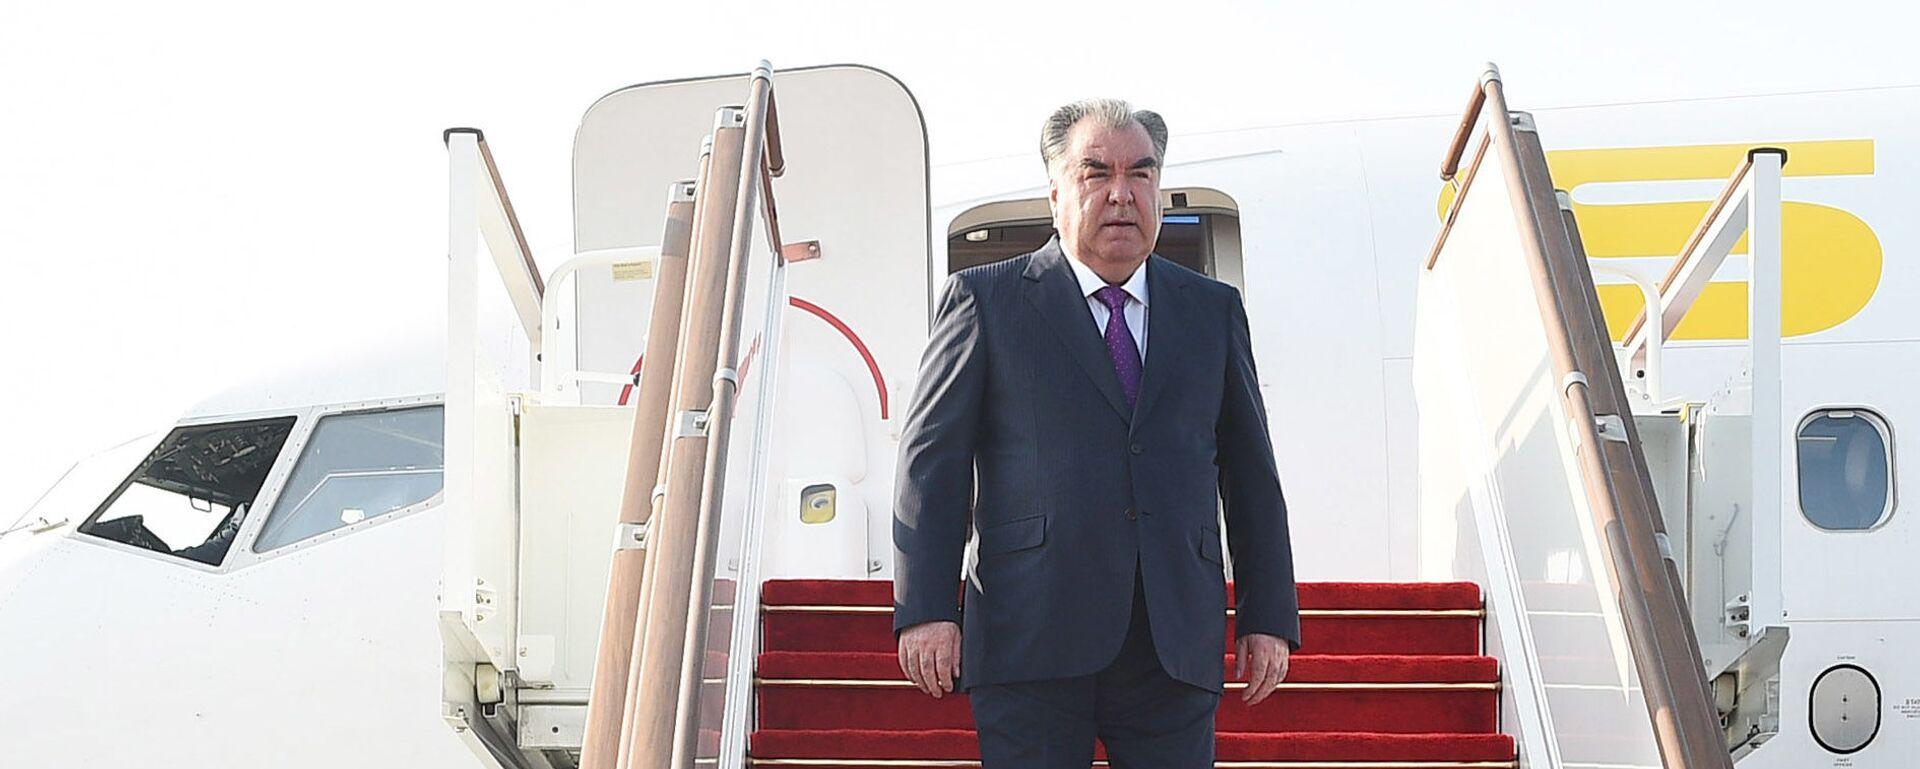 Президент Республики Таджикистан Эмомали Рахмон - Sputnik Таджикистан, 1920, 02.06.2021